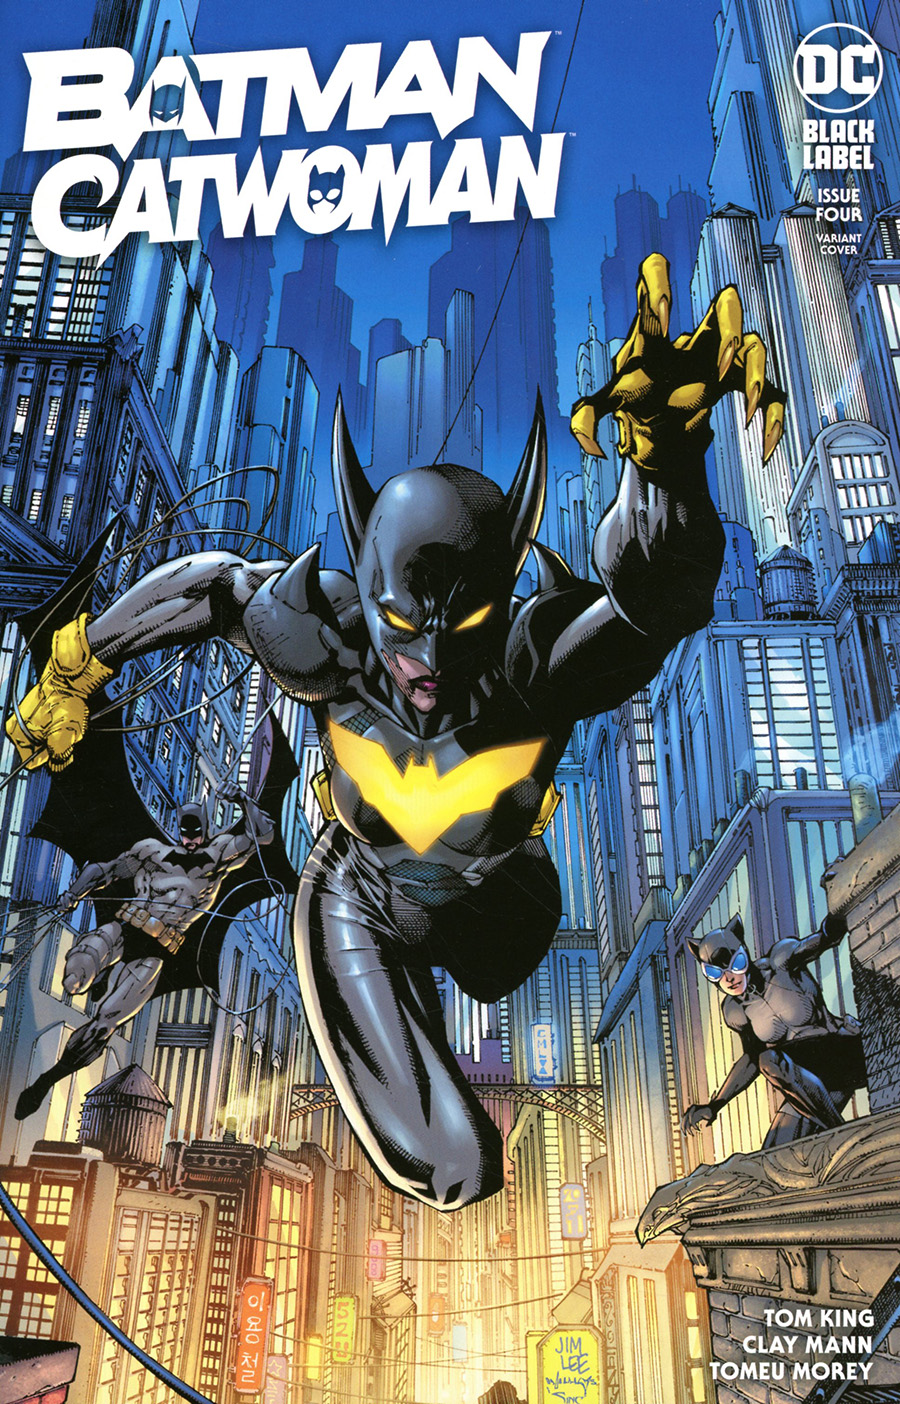 Batman Catwoman #4 Cover B Variant Jim Lee & Scott Williams Cover